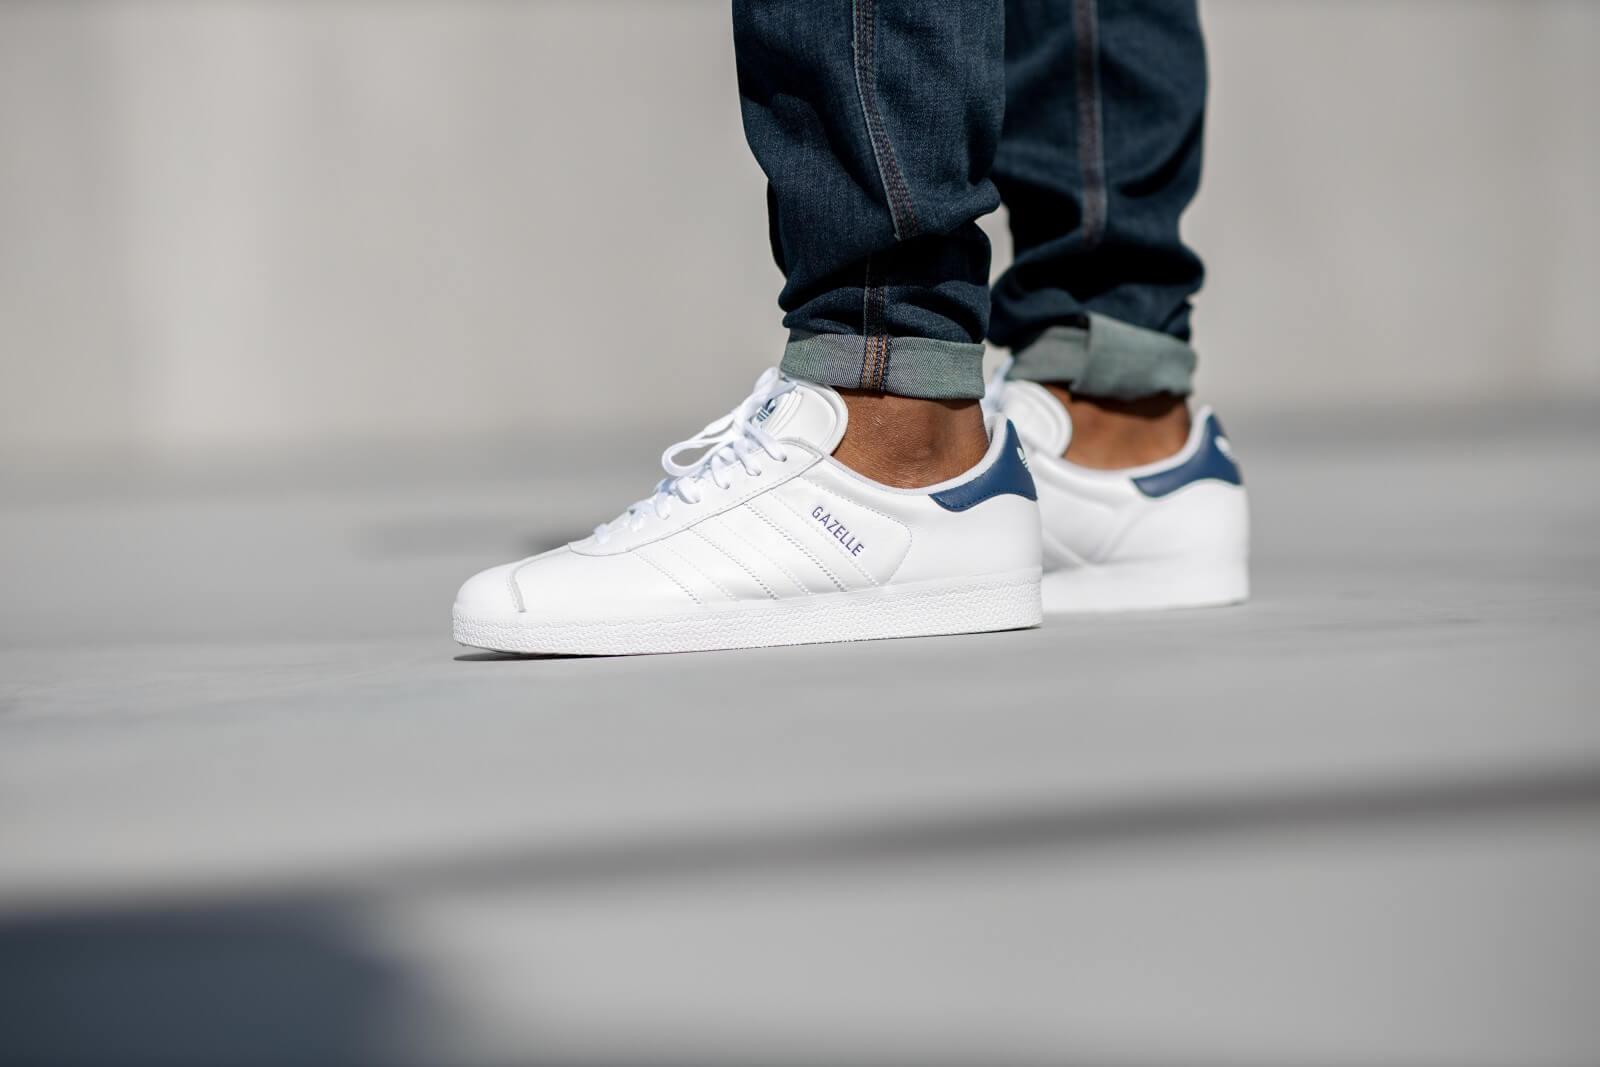 Adidas Gazelle Footwear White/Dark Blue